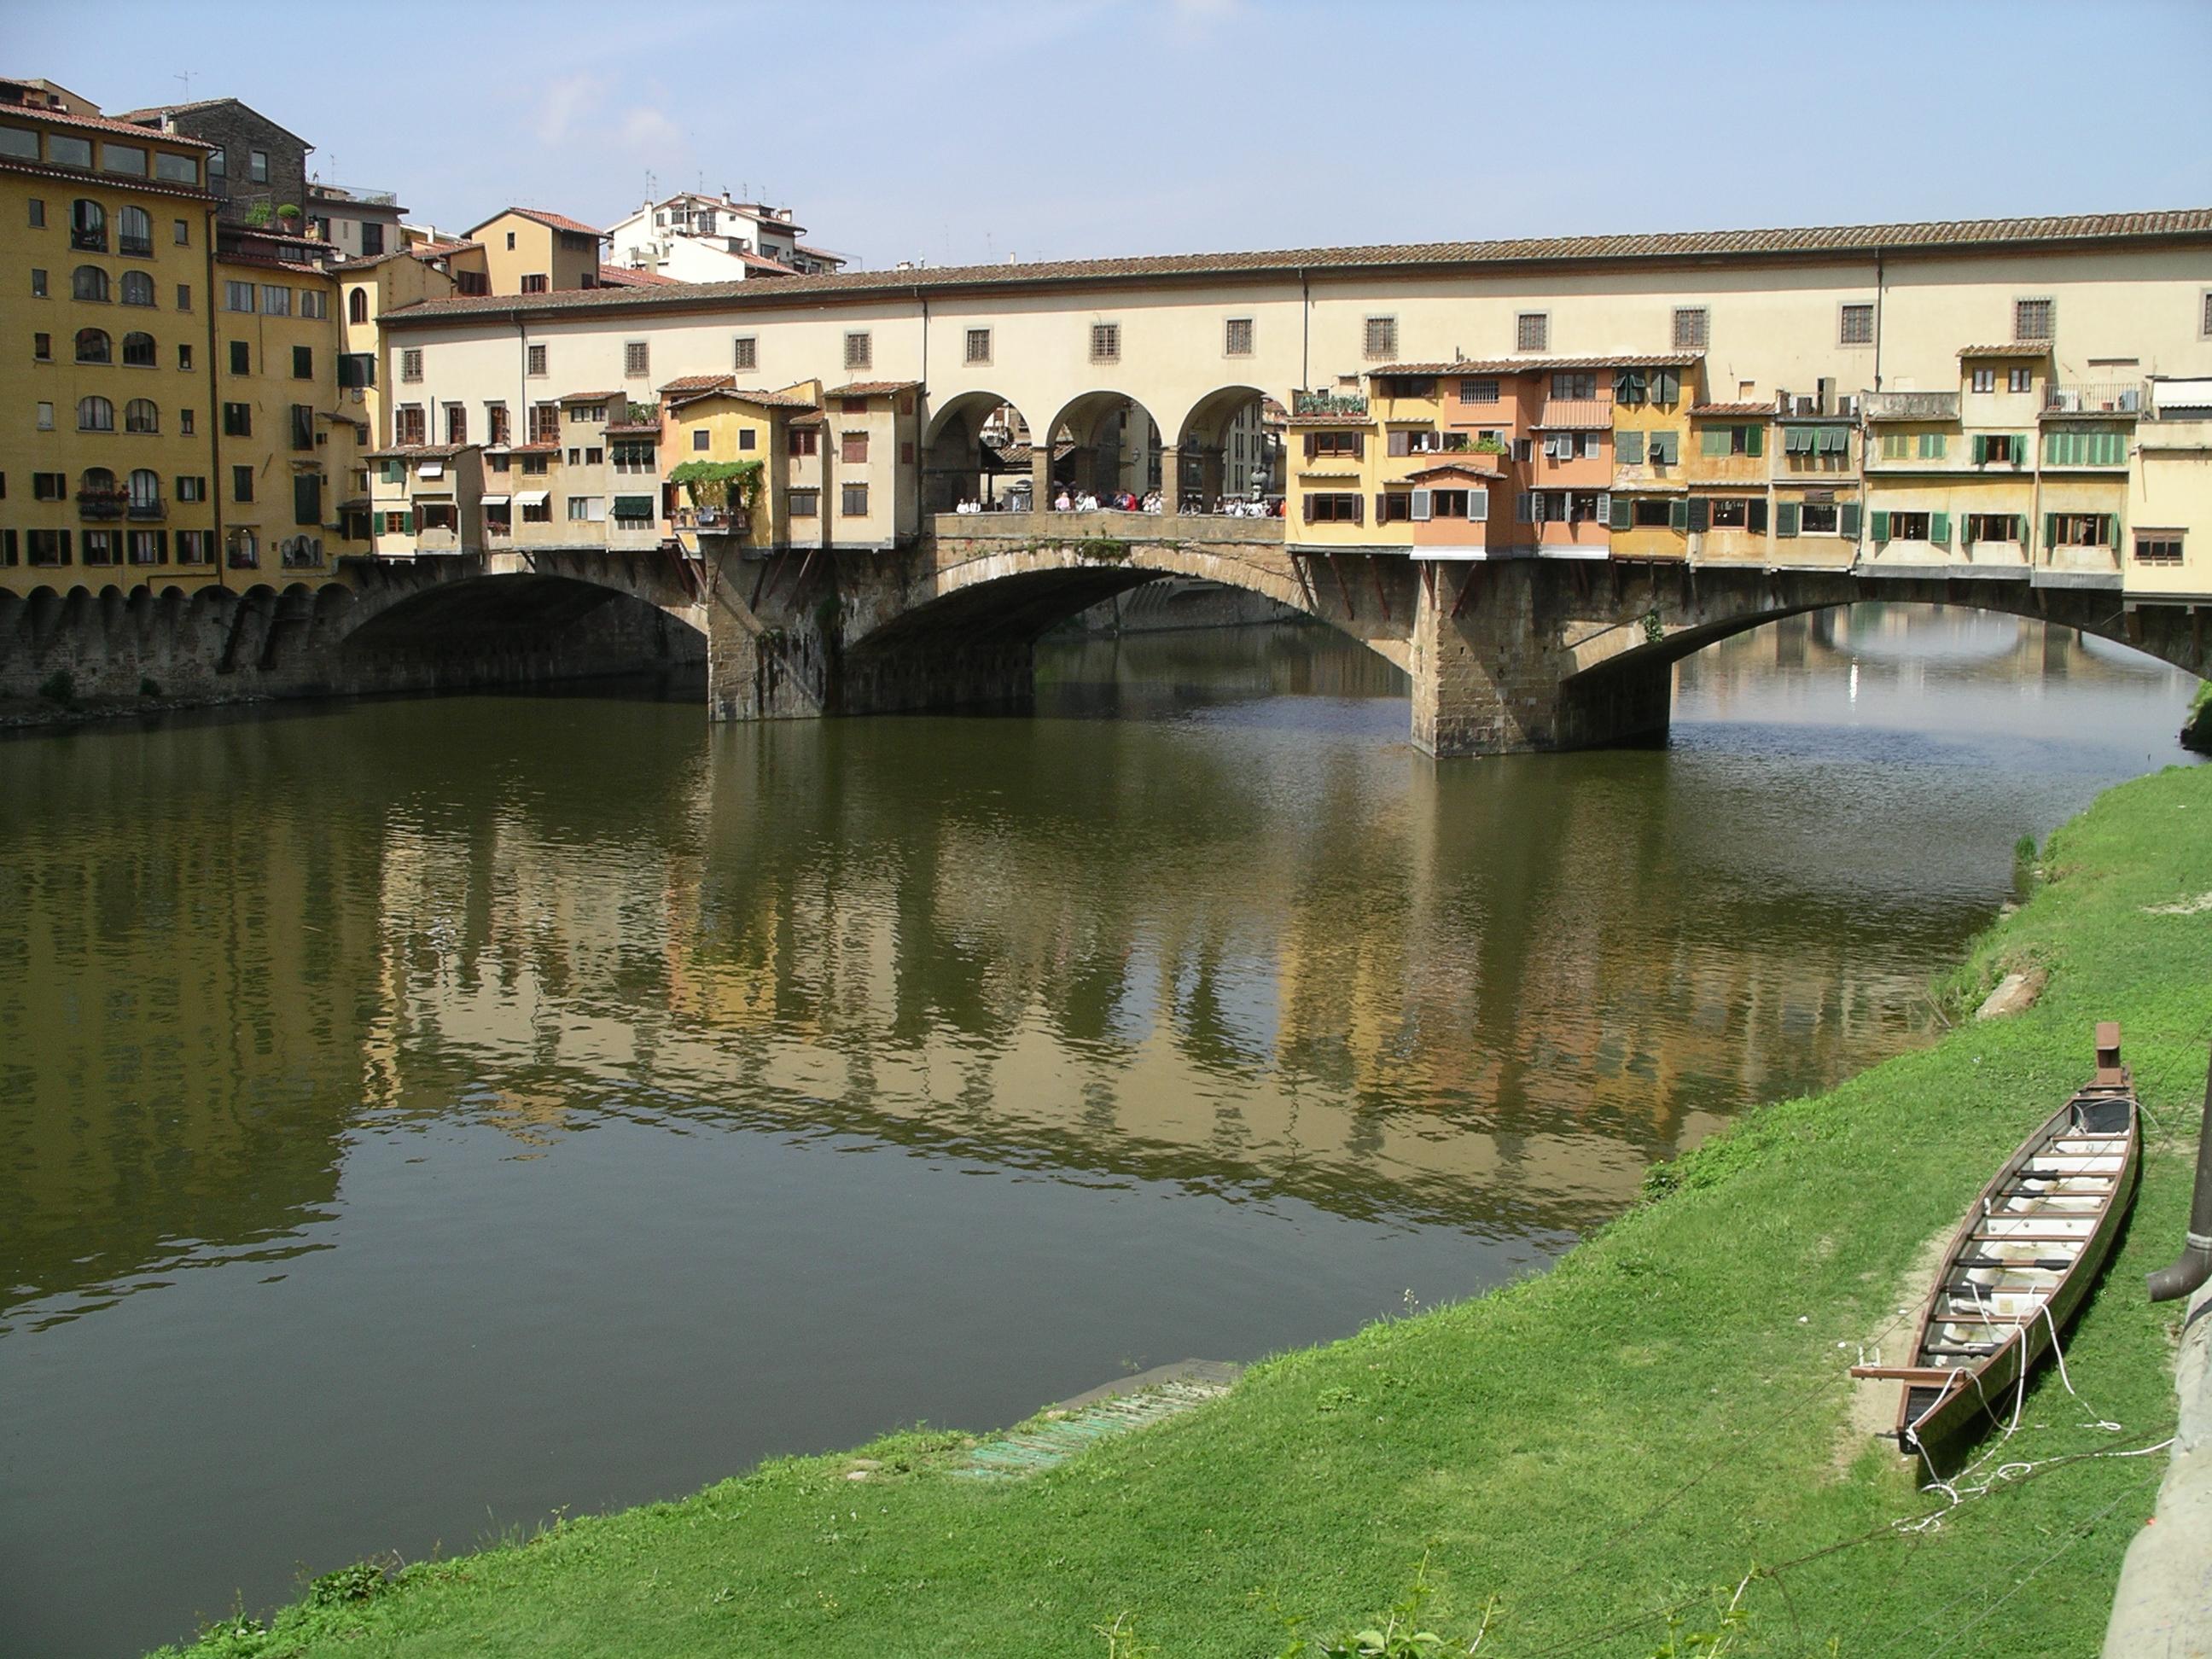 Arhitektura koja spaja ljude - Mostovi Ponte20vecchio2001